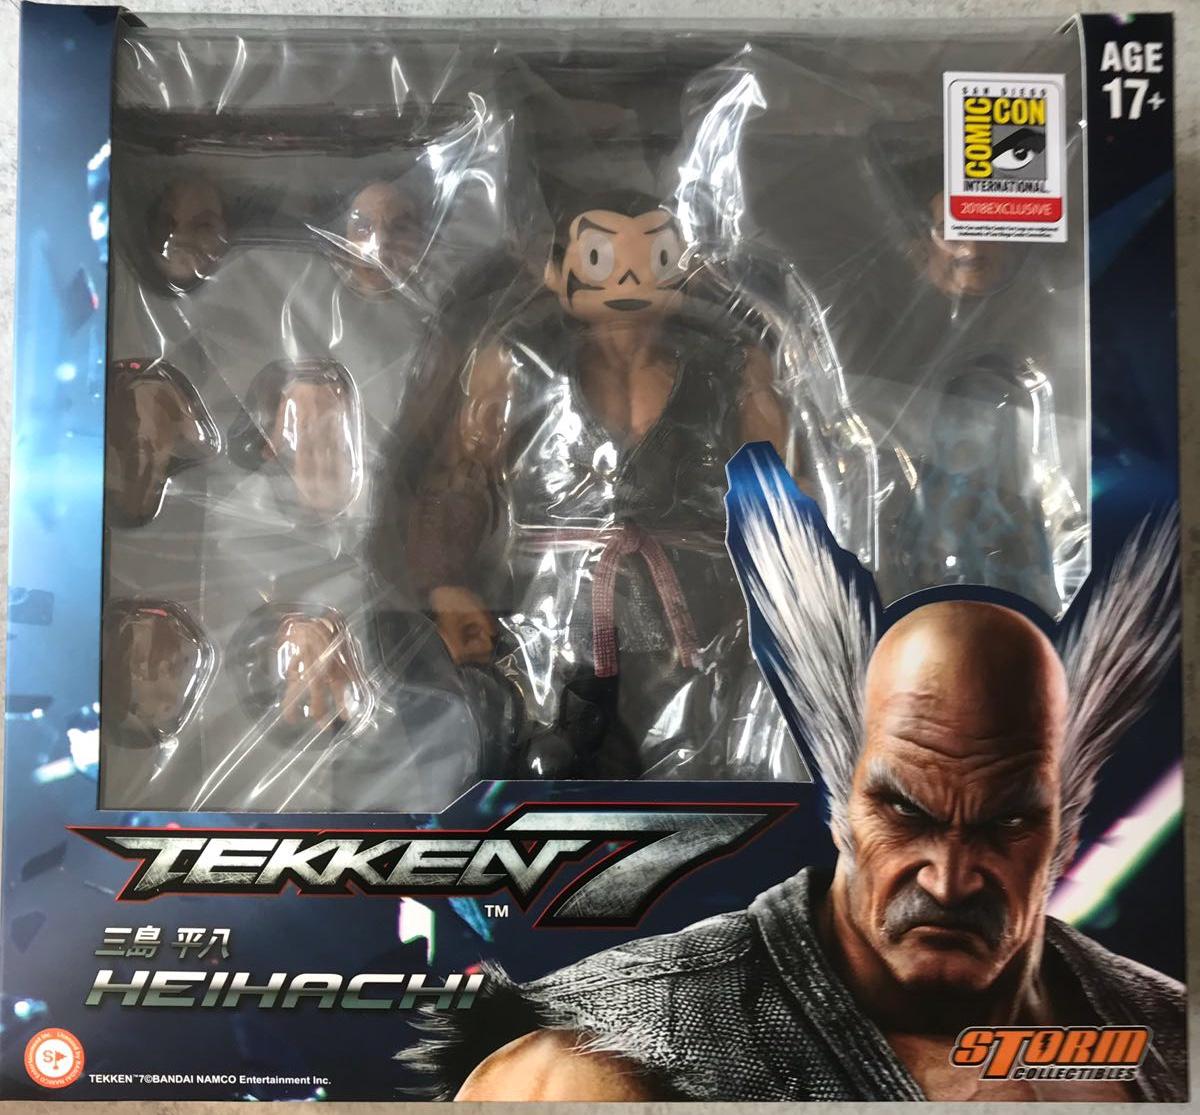 Storm Collectibles Tekken 7 Heihachi Mishima Special Edition Sdcc 2018 Exclusive